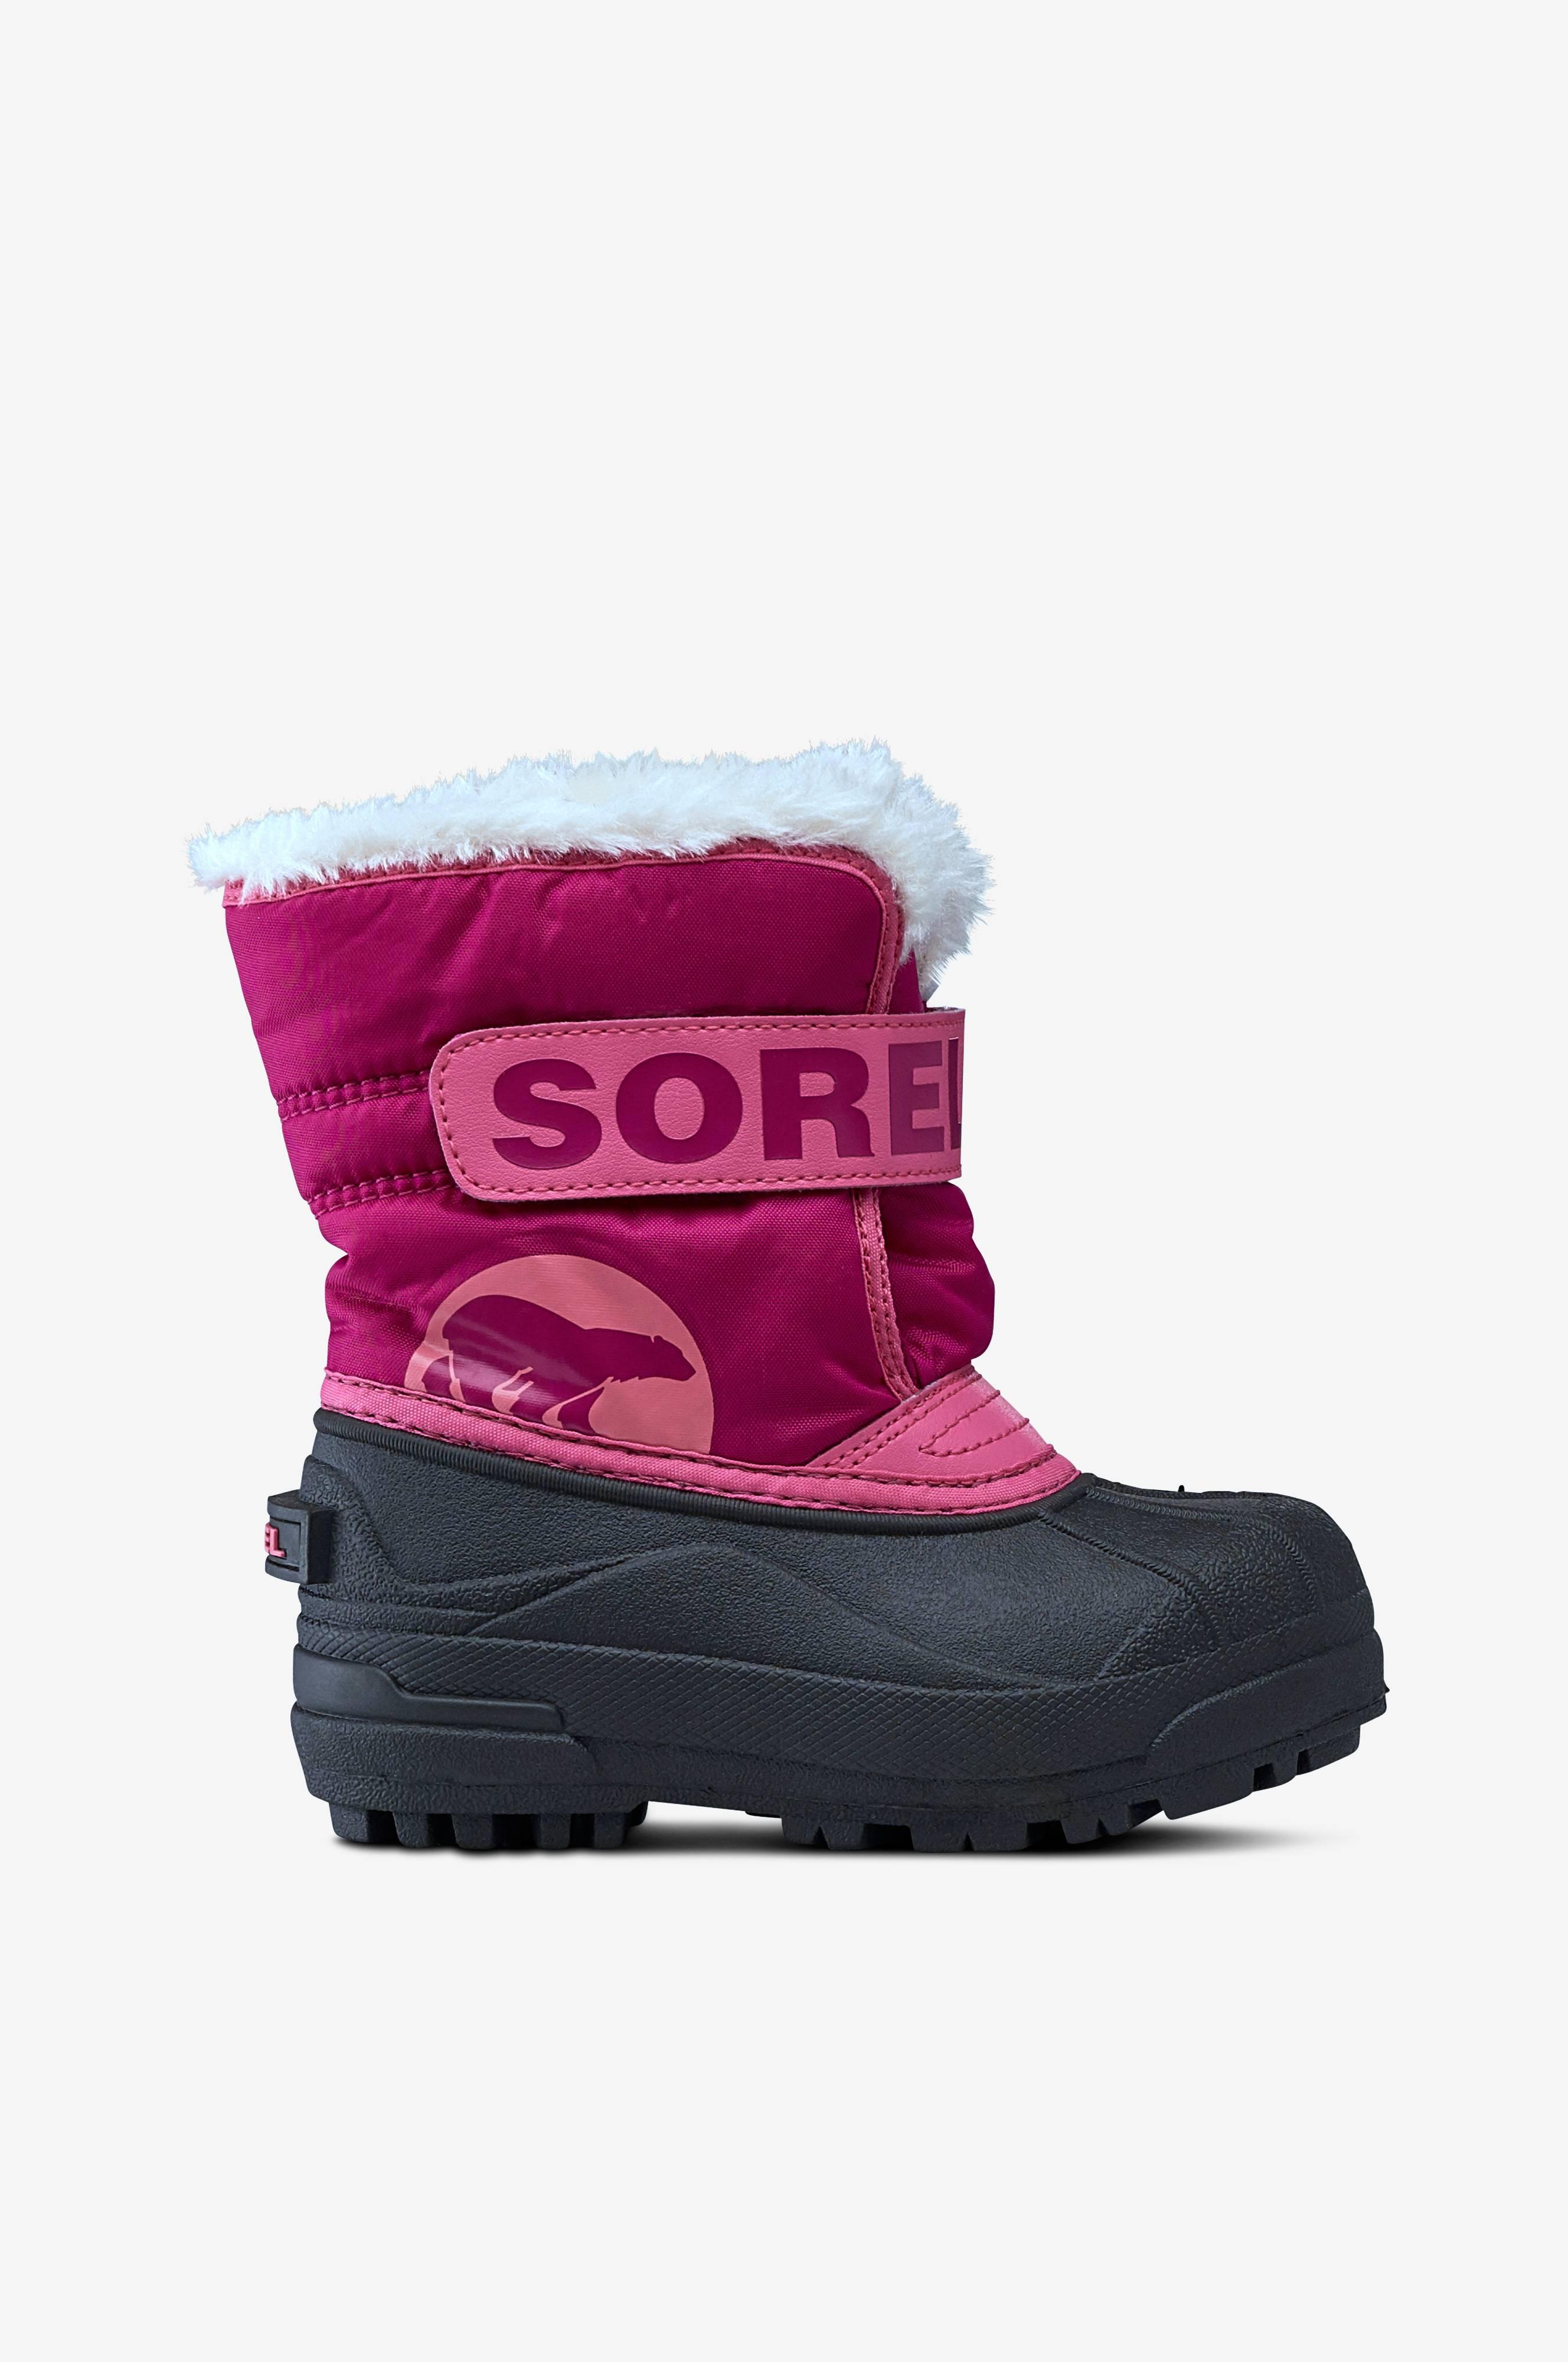 Sorel Snow Commander talvikengät - Roosa - Lapset - Ellos.fi ab77d8d1e7